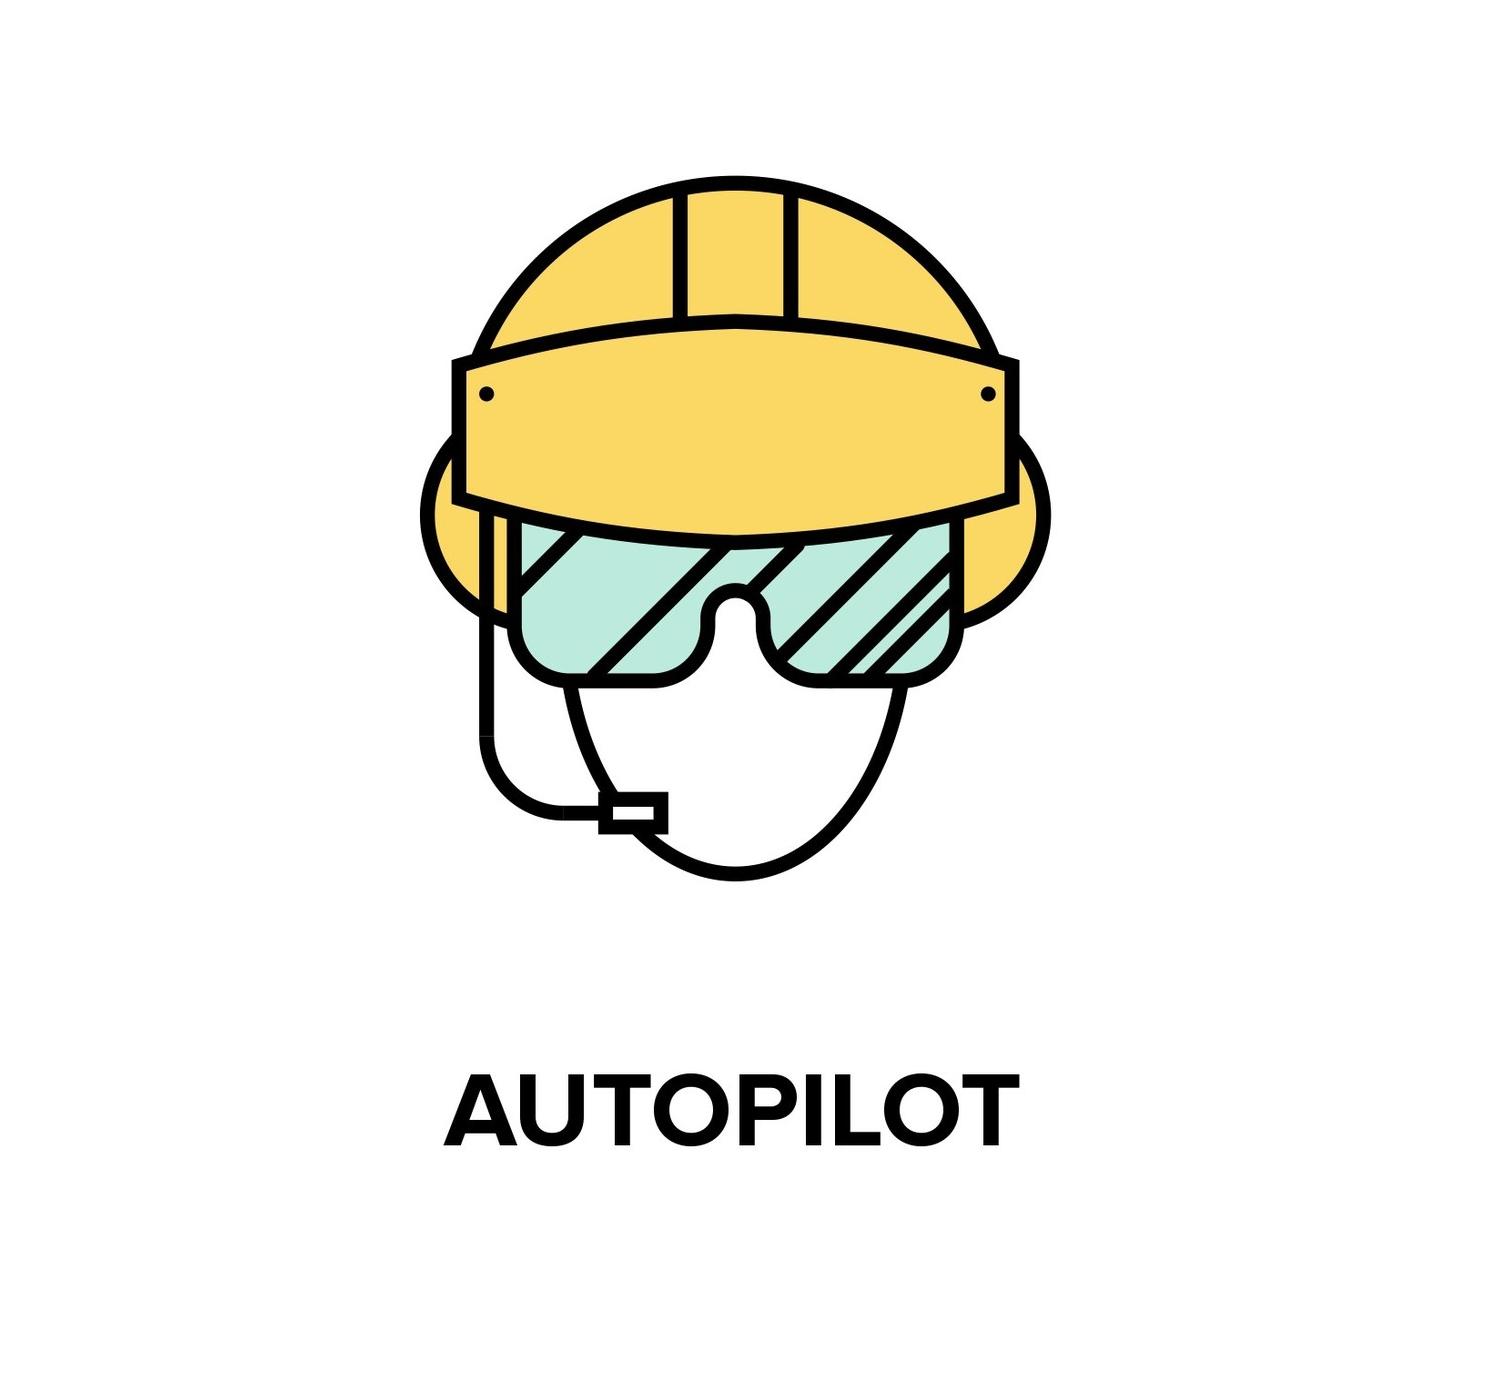 air_drones_flying_uav_robotics_industry_flat_line_icons_set_technology_innovation_remote_control_wireless_system_vector_illustration_concept (2).jpg